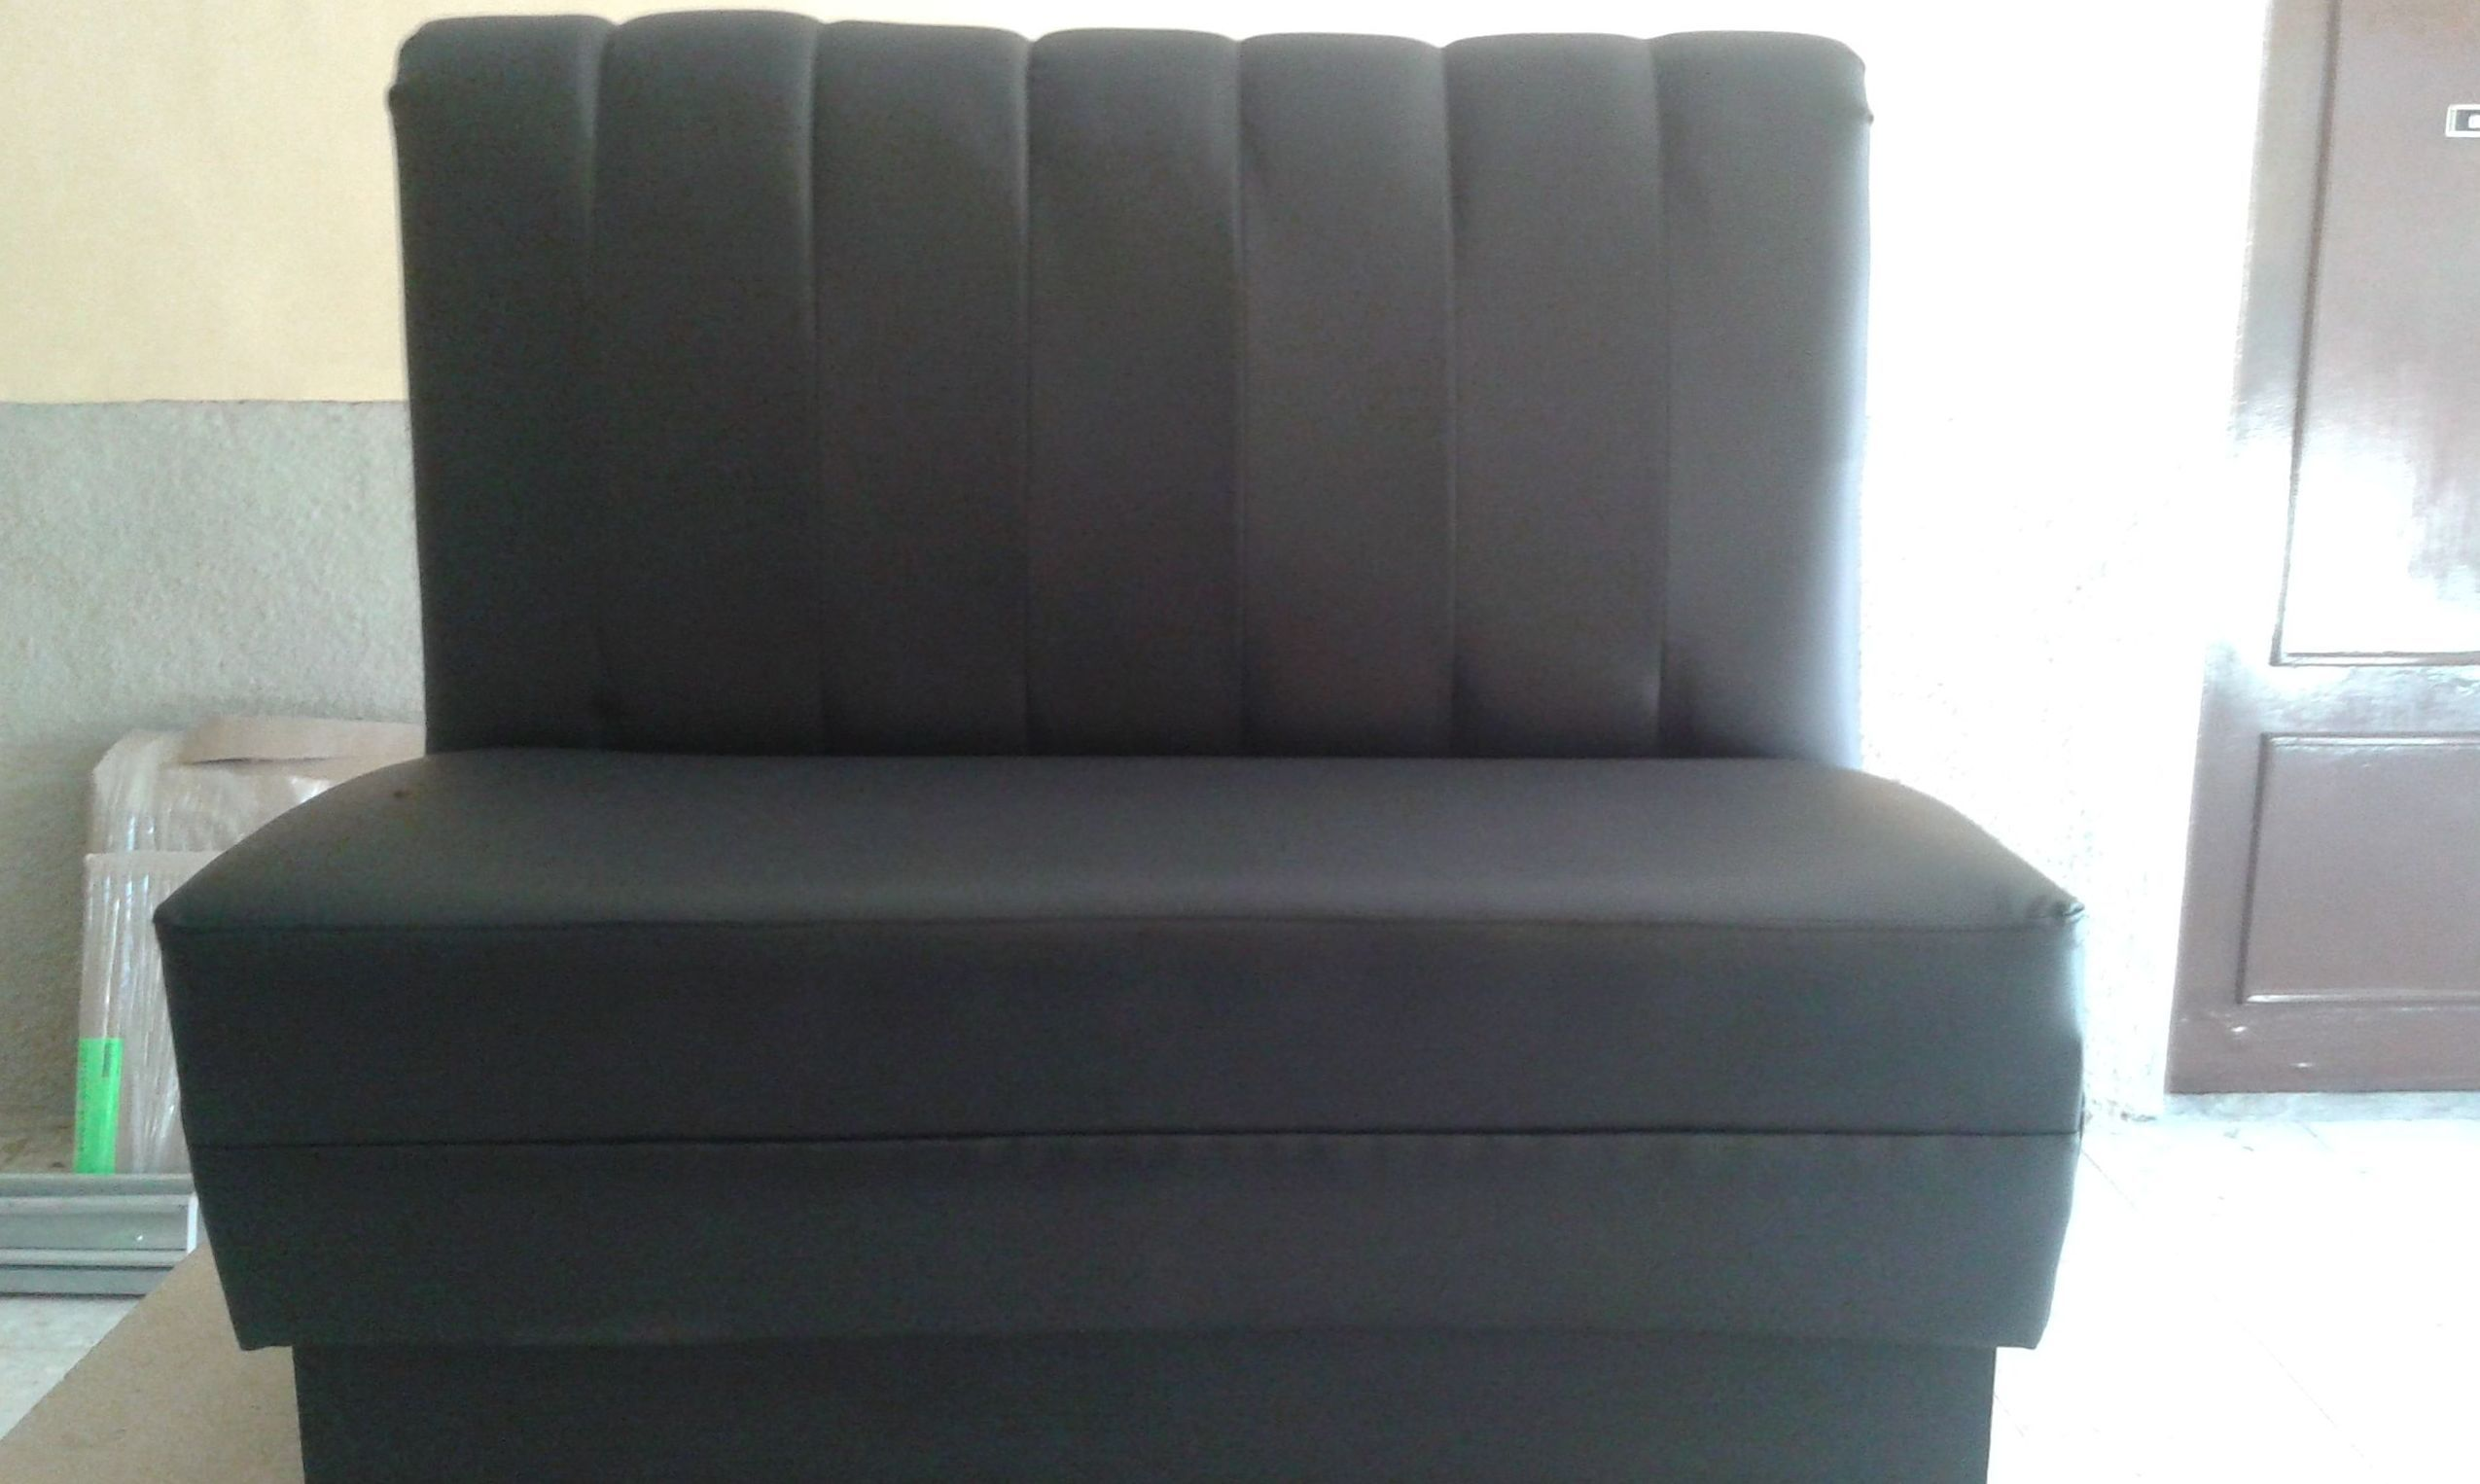 precios sofas ta quatro ing sofa ne demek de tapizados sofás en toledo económicos